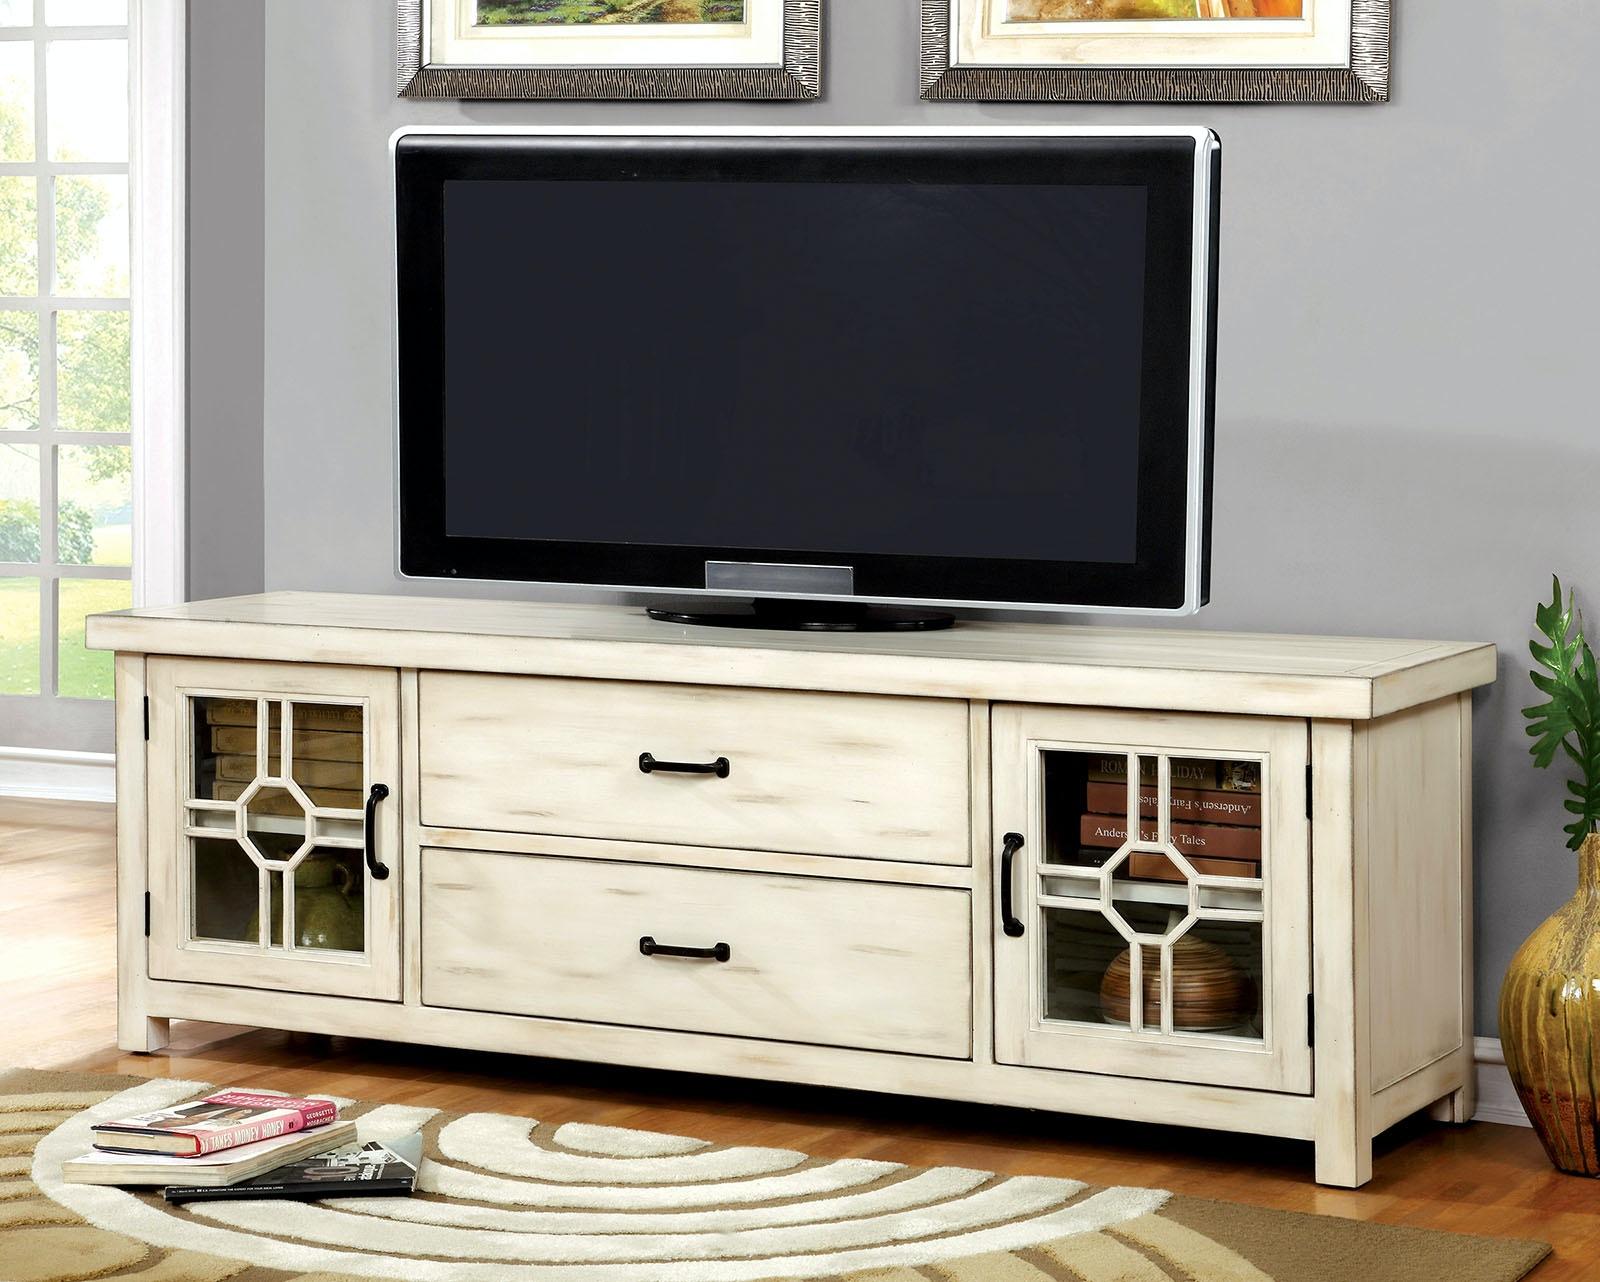 Furniture Of America Home Entertainment 62 Tv Console Cm5230 Tv 62